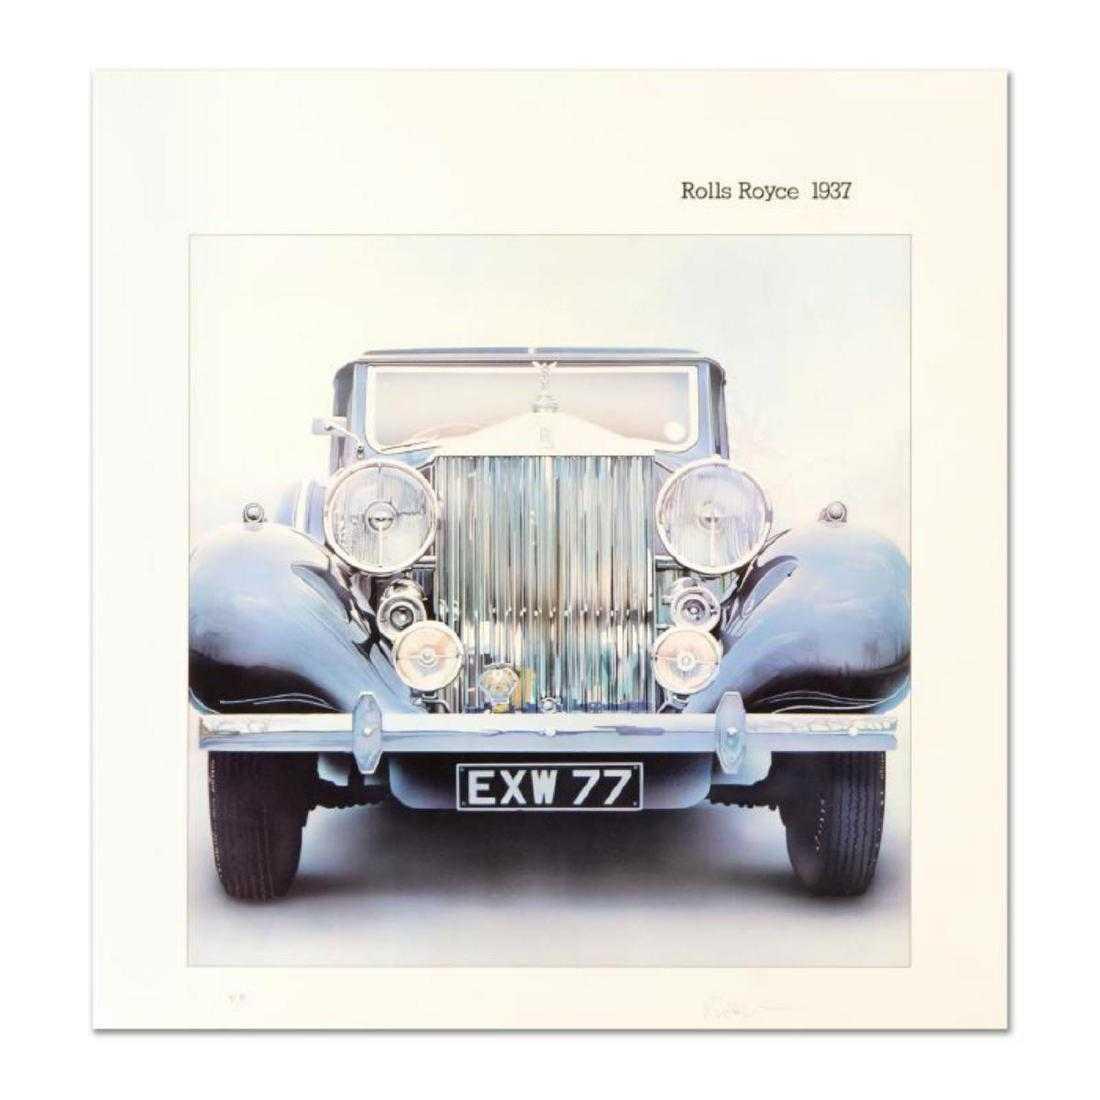 Wolfgang Kuzel Rolls Royce Limited Edition